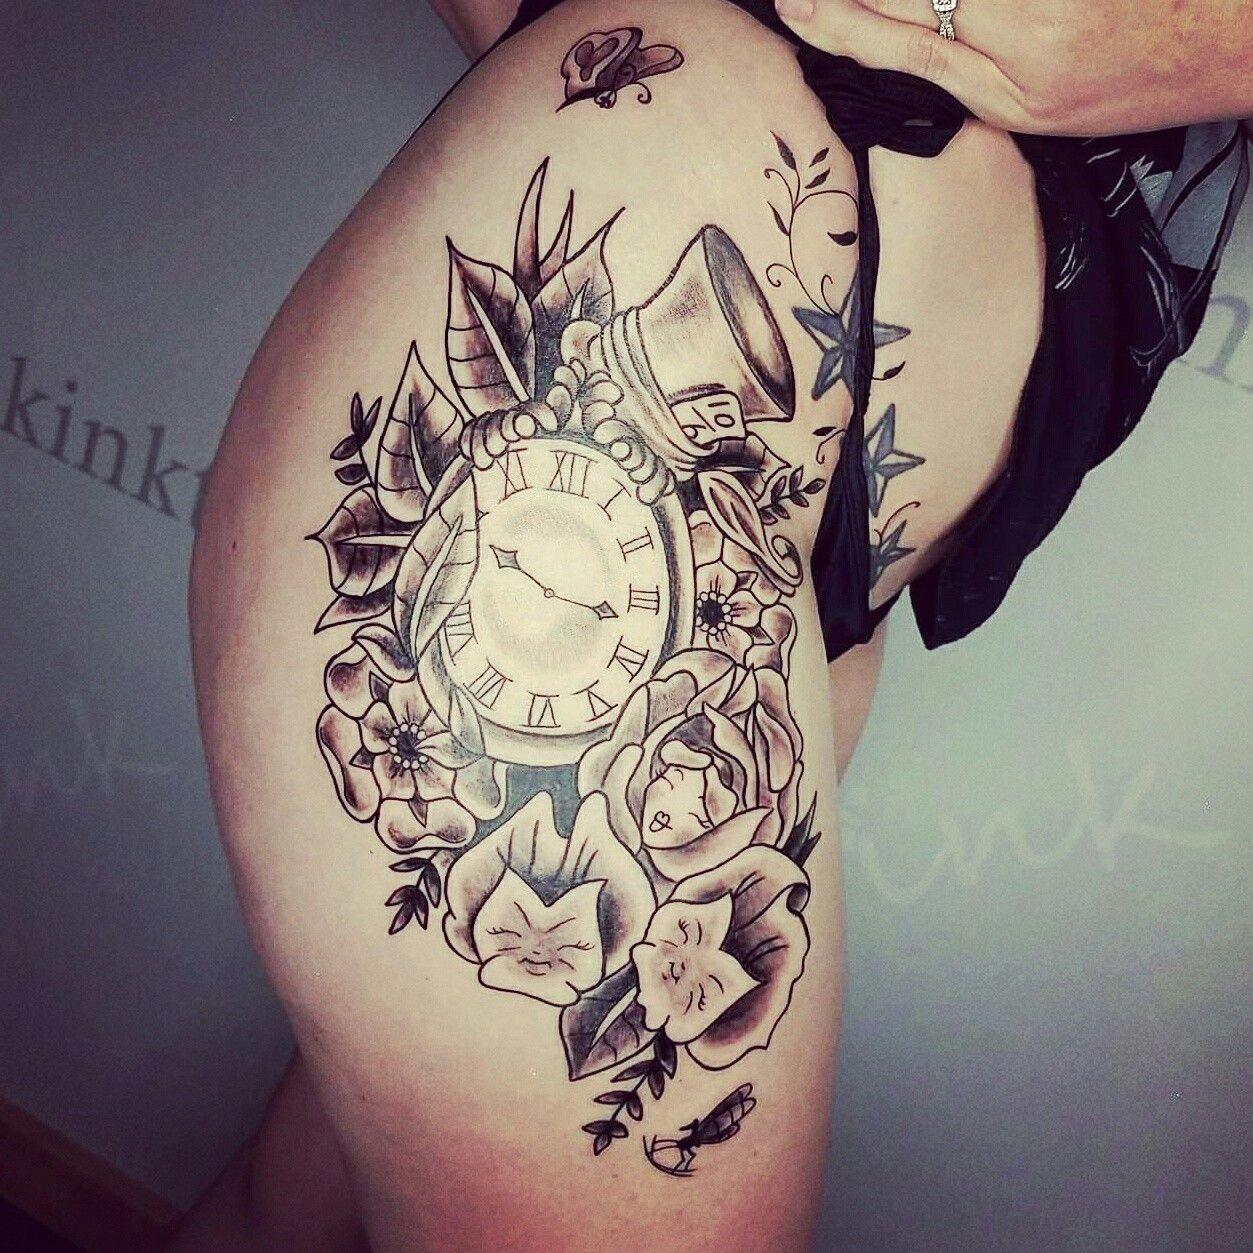 10 Trendy Alice In Wonderland Tattoo Ideas custom black and grey alice in wonderland tattoo tattoos i have 1 2021